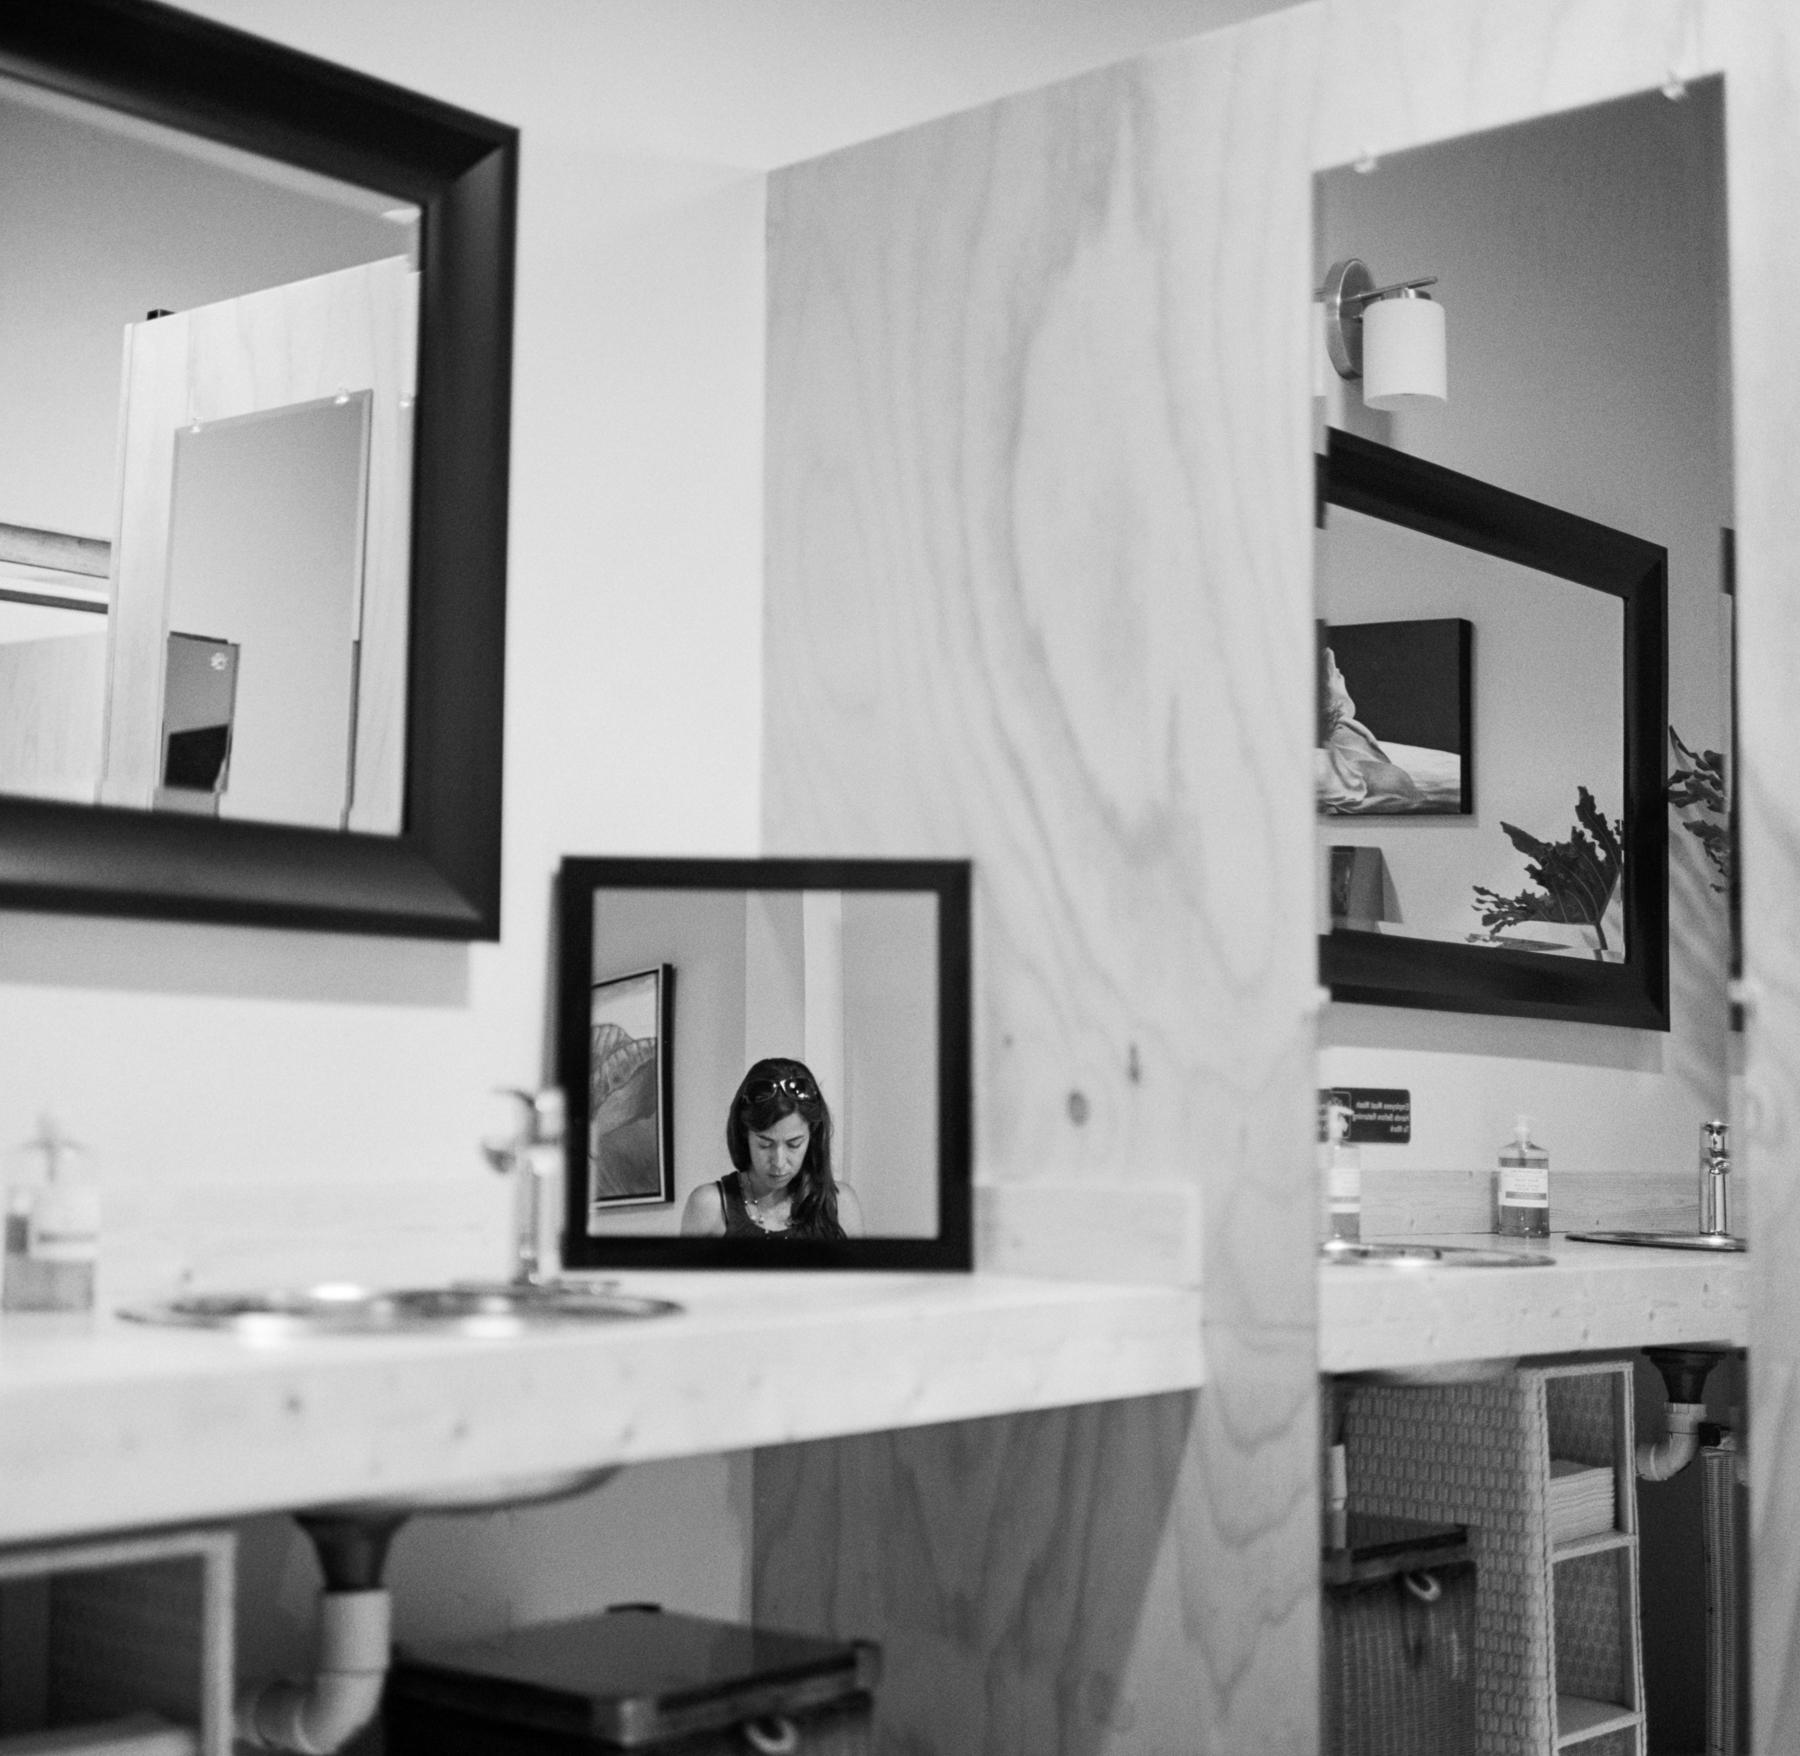 40 wine place bathroom mirror sm (1 of 1).jpg